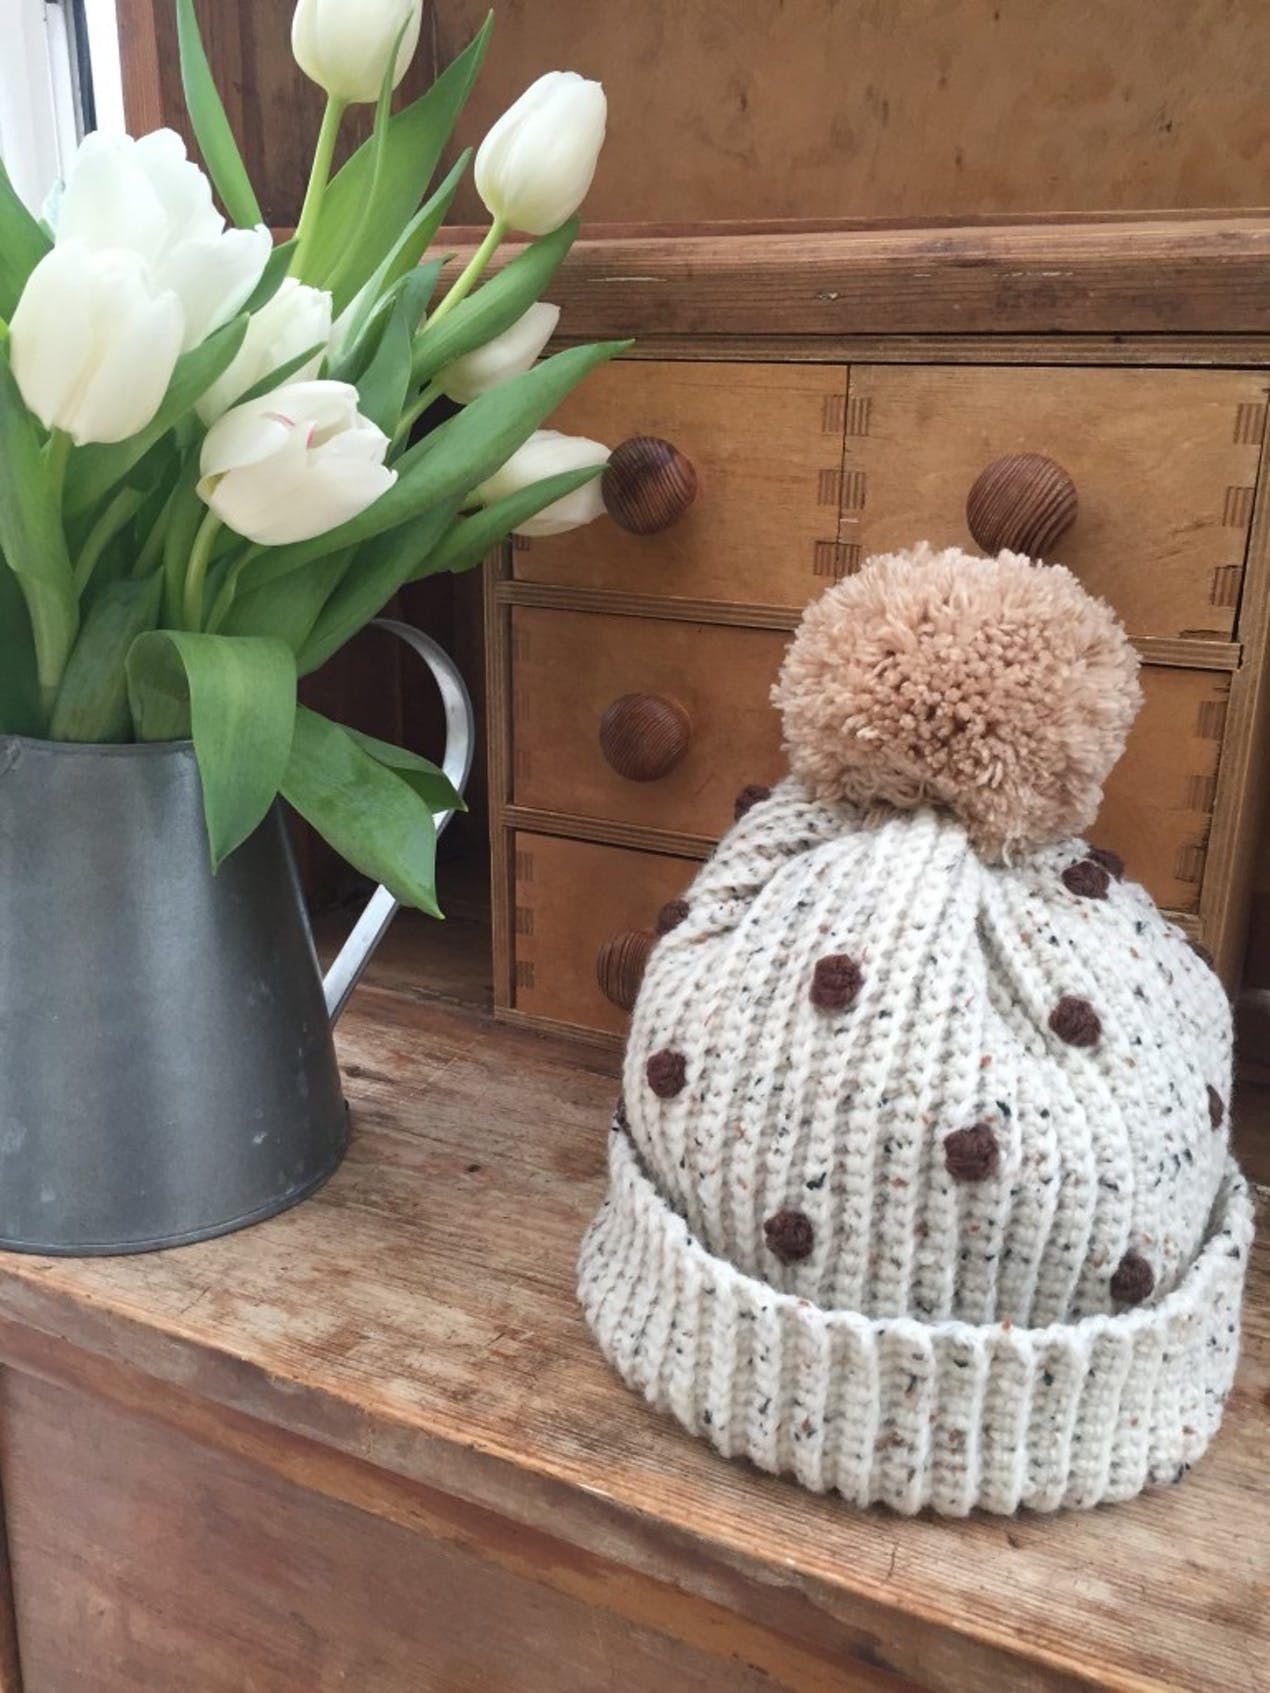 Crochet Club: Ladies bobbly bobble hat | LoveCrafts ...